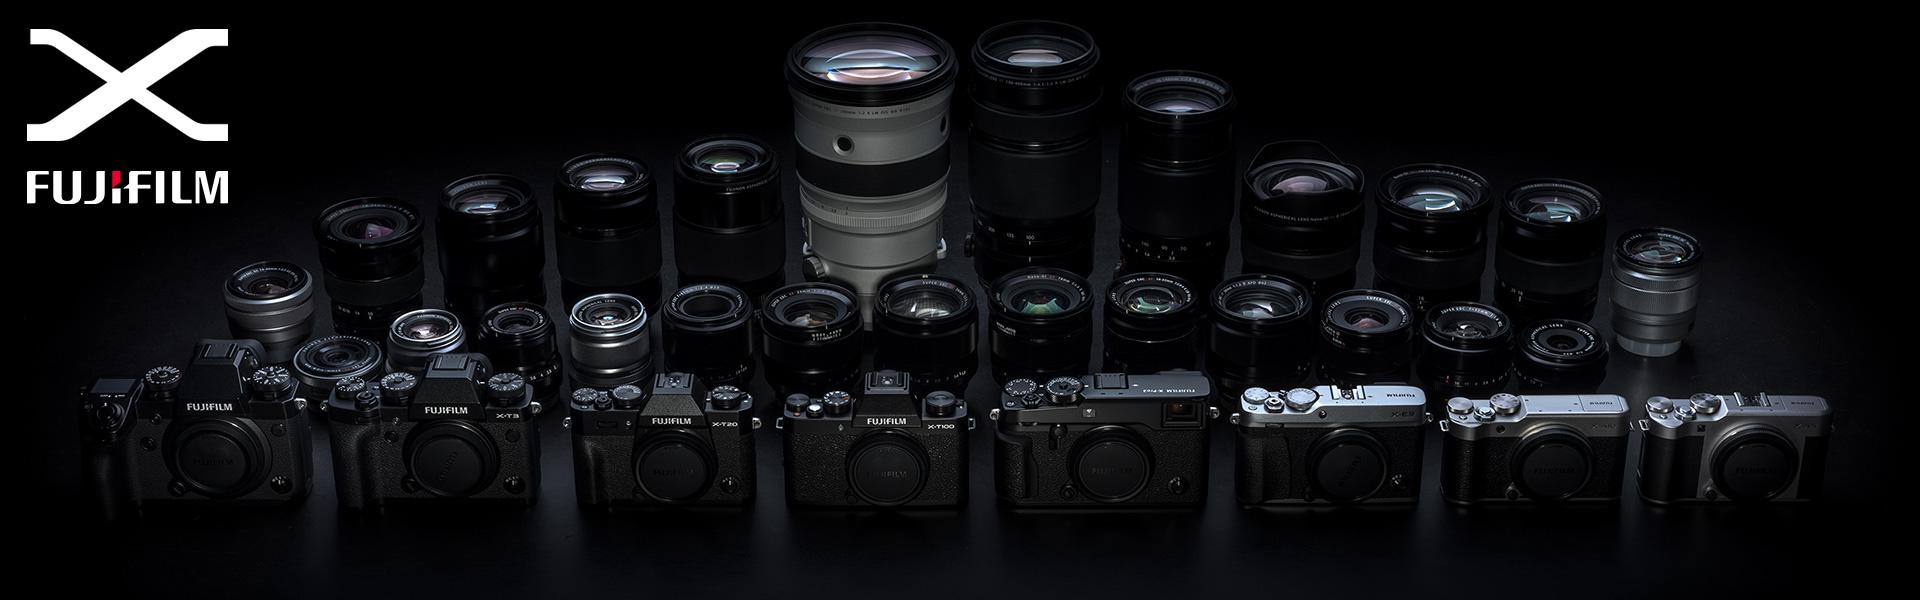 [photo] 다양한 후지필름 X 시스템 디지털카메라 및 렌즈